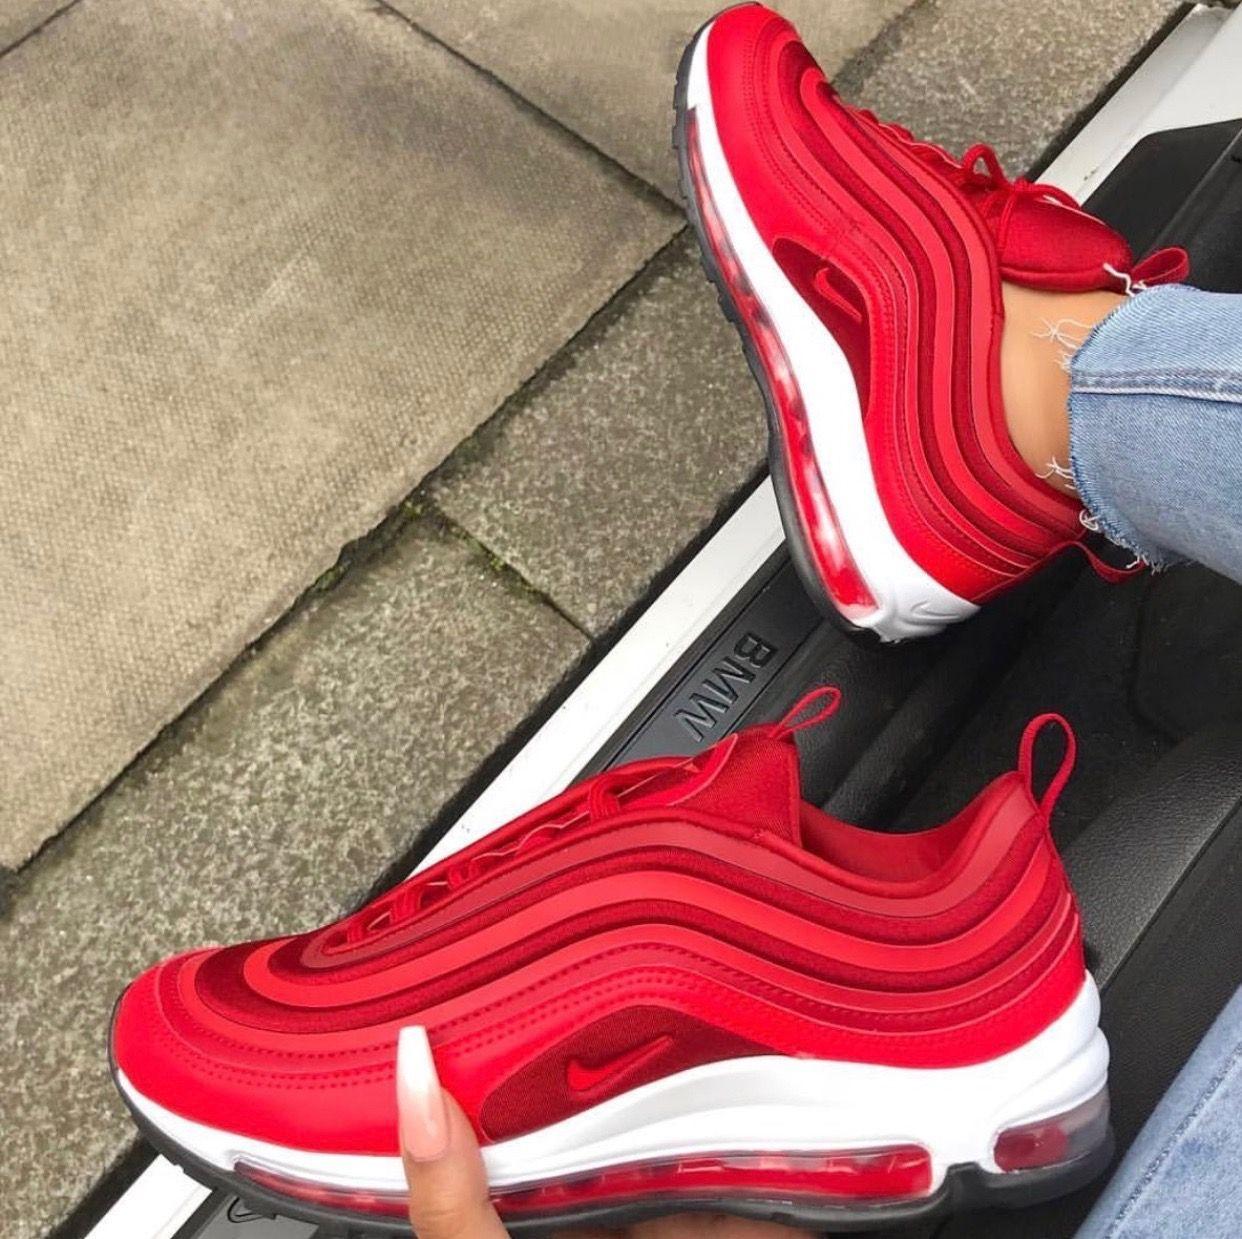 buy popular 8ca46 8baf2 Scarpe Nike. Rosso Scuro. Follow   Tropic M for more ❄  TennisShoes Sneaker  Bianche, Scarpe Col Tacco